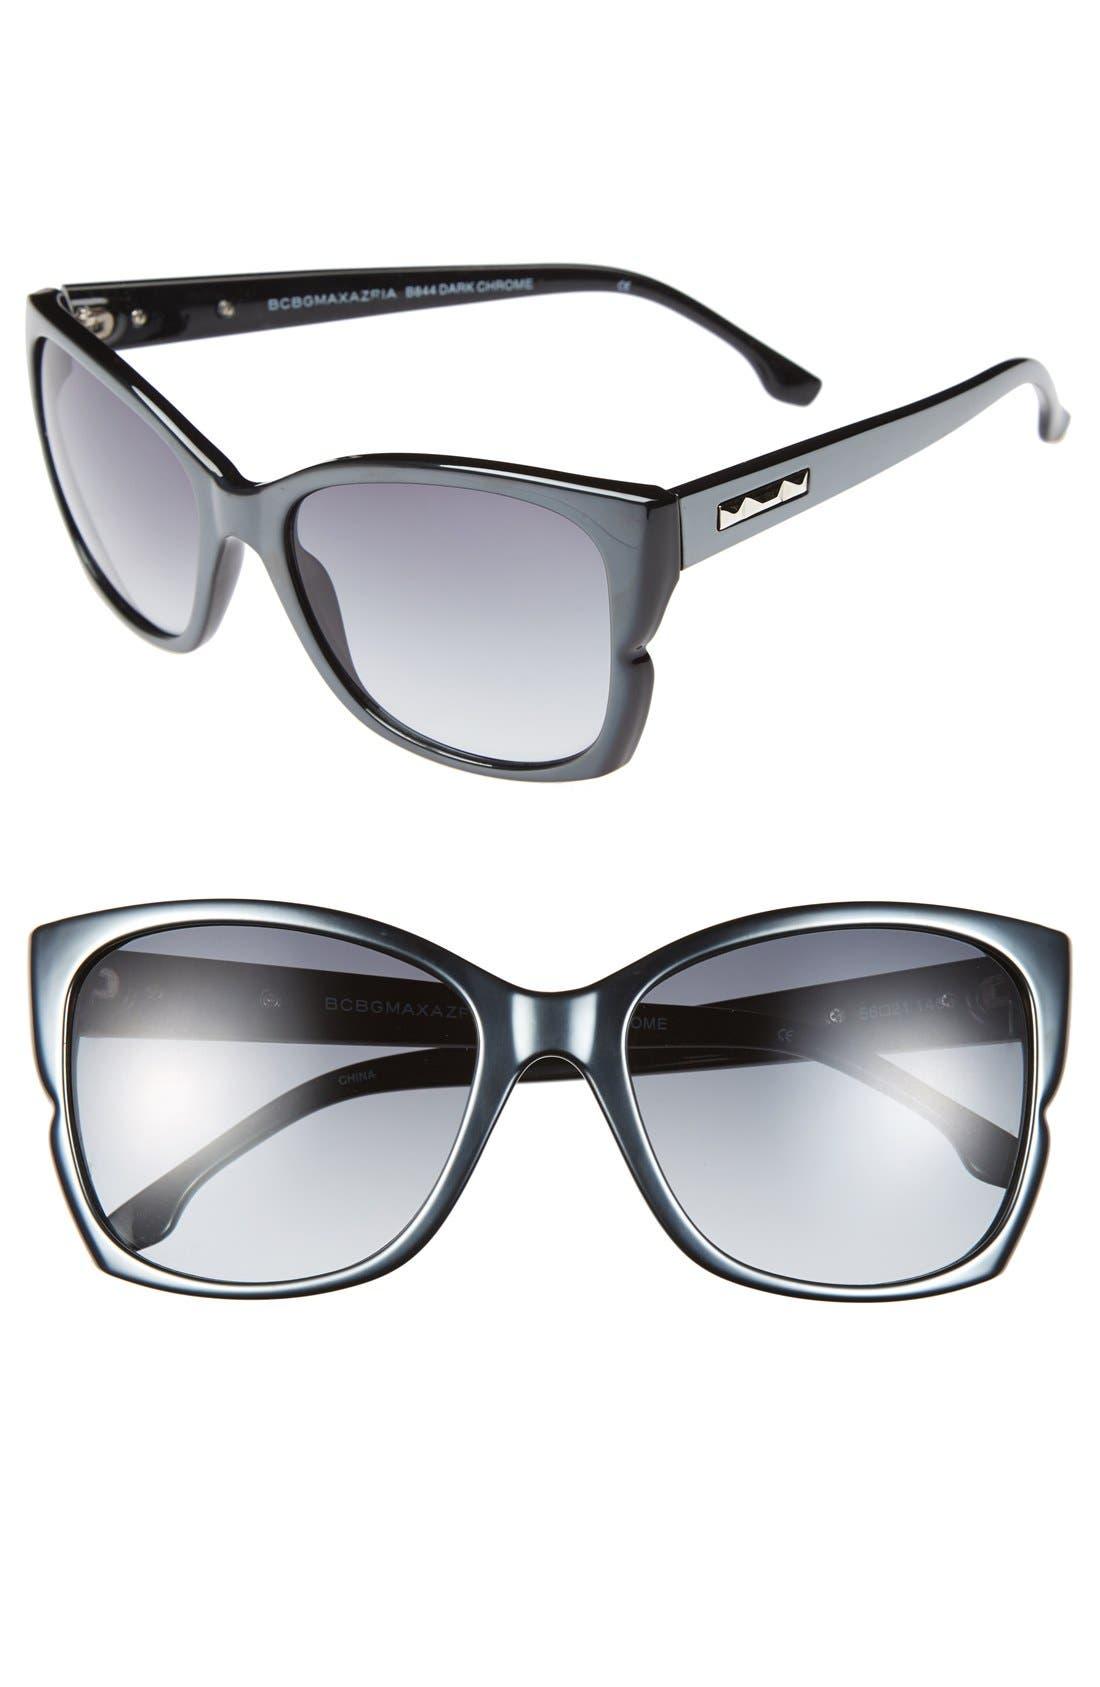 Main Image - BCBGMAXAZRIA 56mm Butterfly Sunglasses